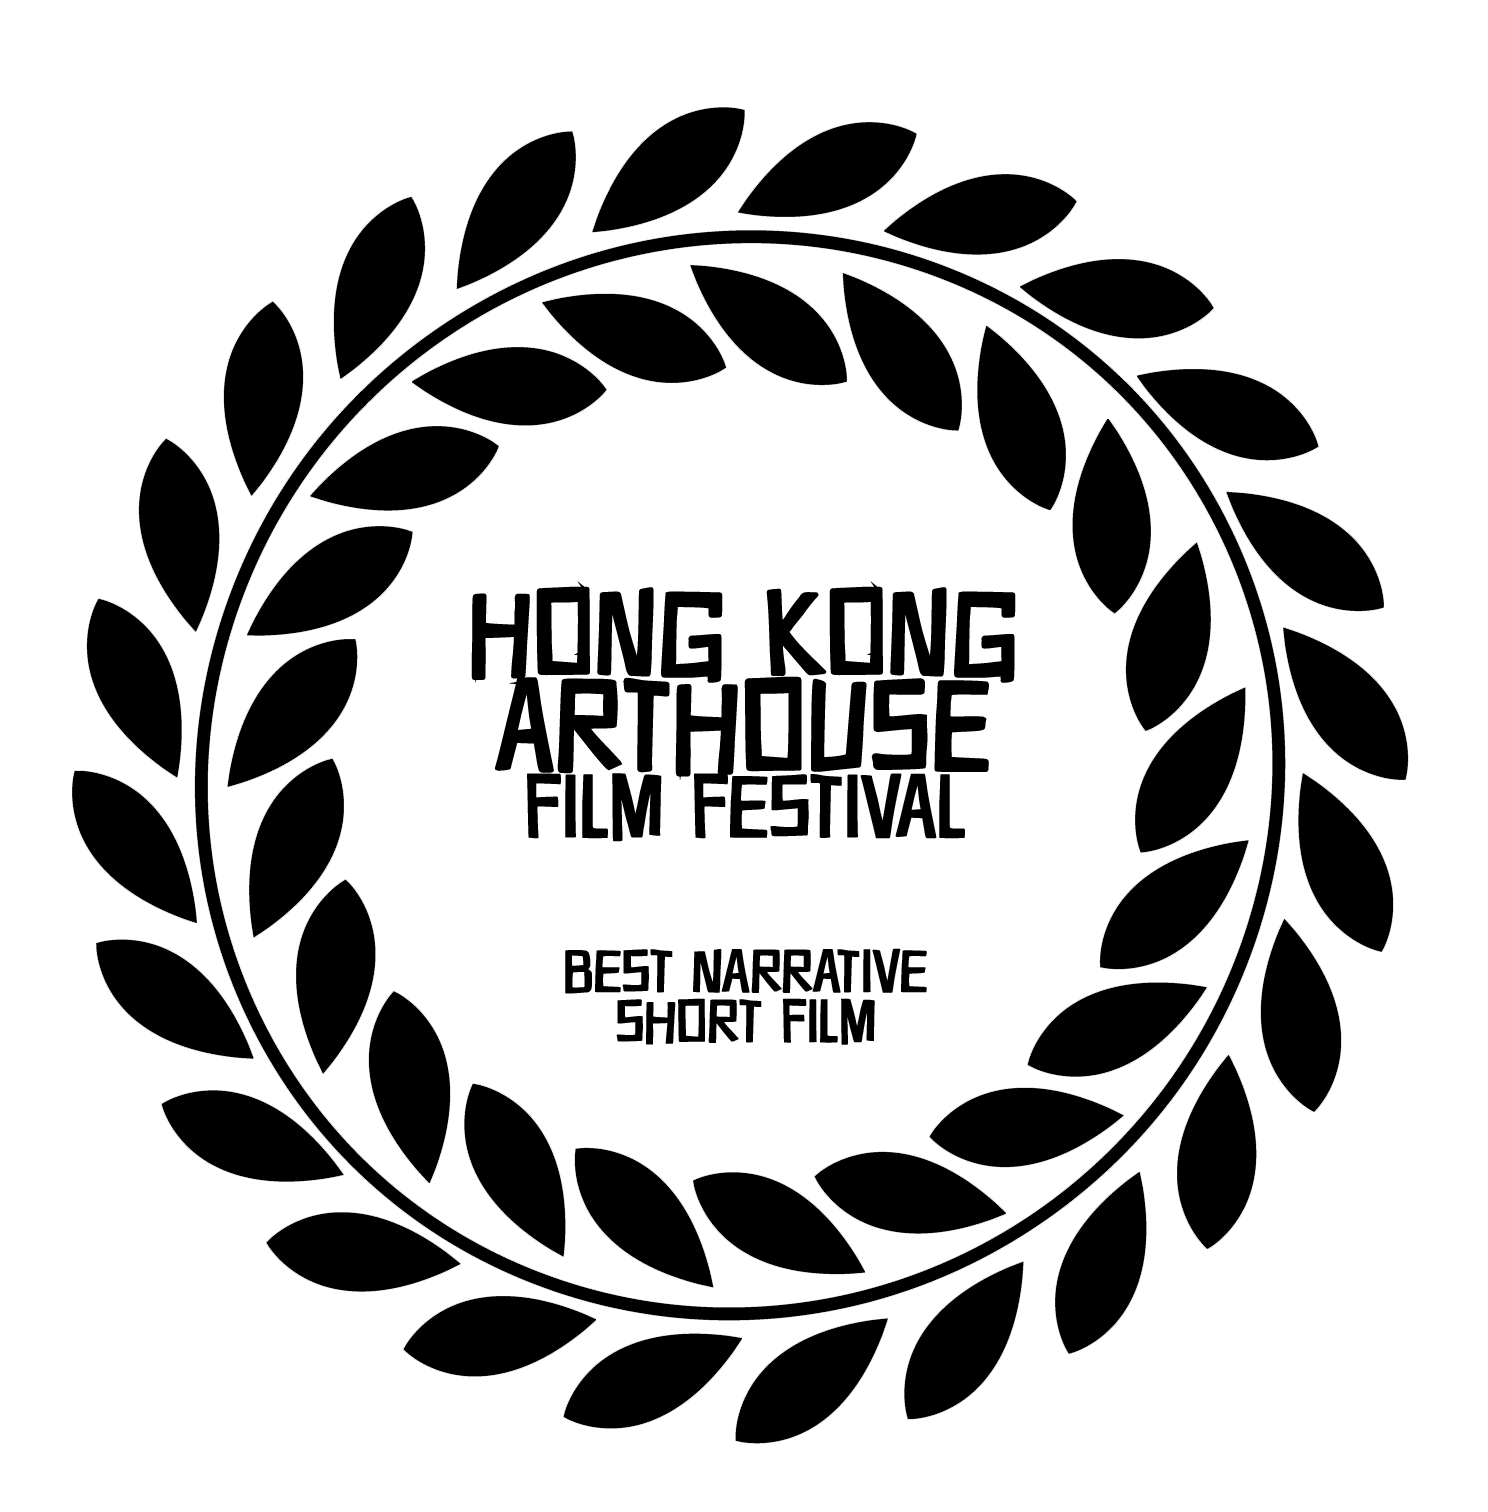 HK_bestfilm_narshort.png